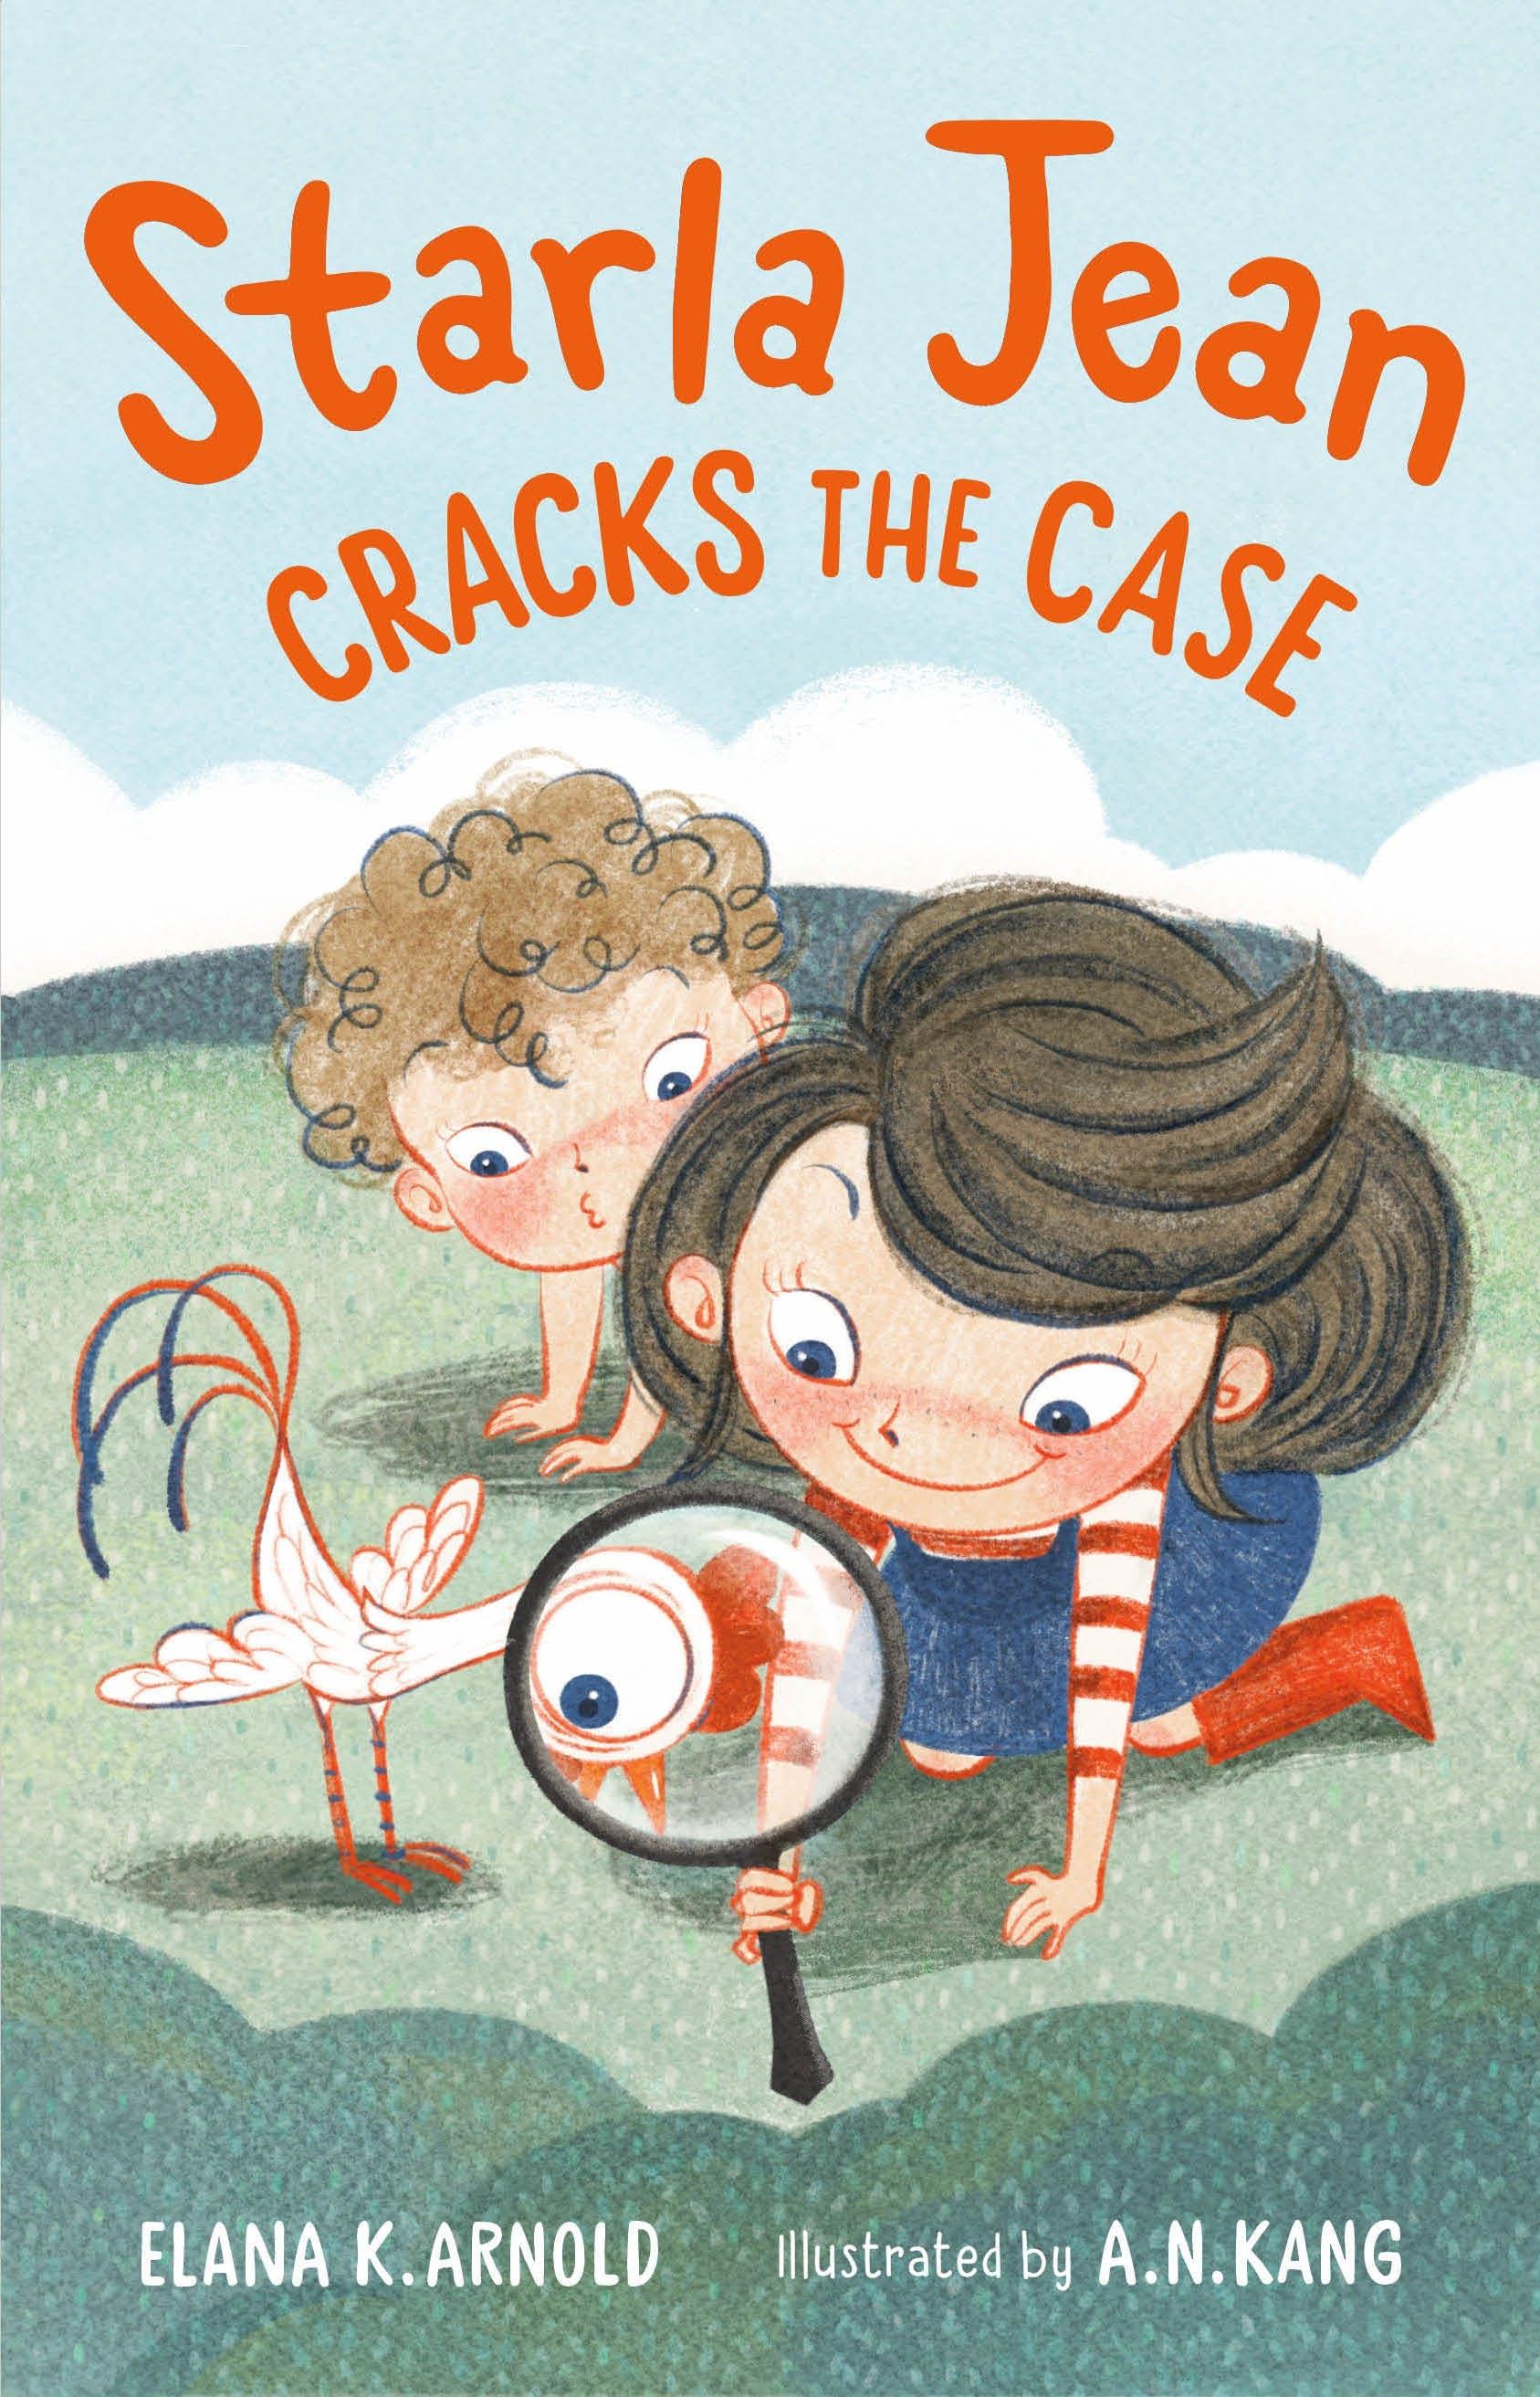 Image of Starla Jean Cracks the Case